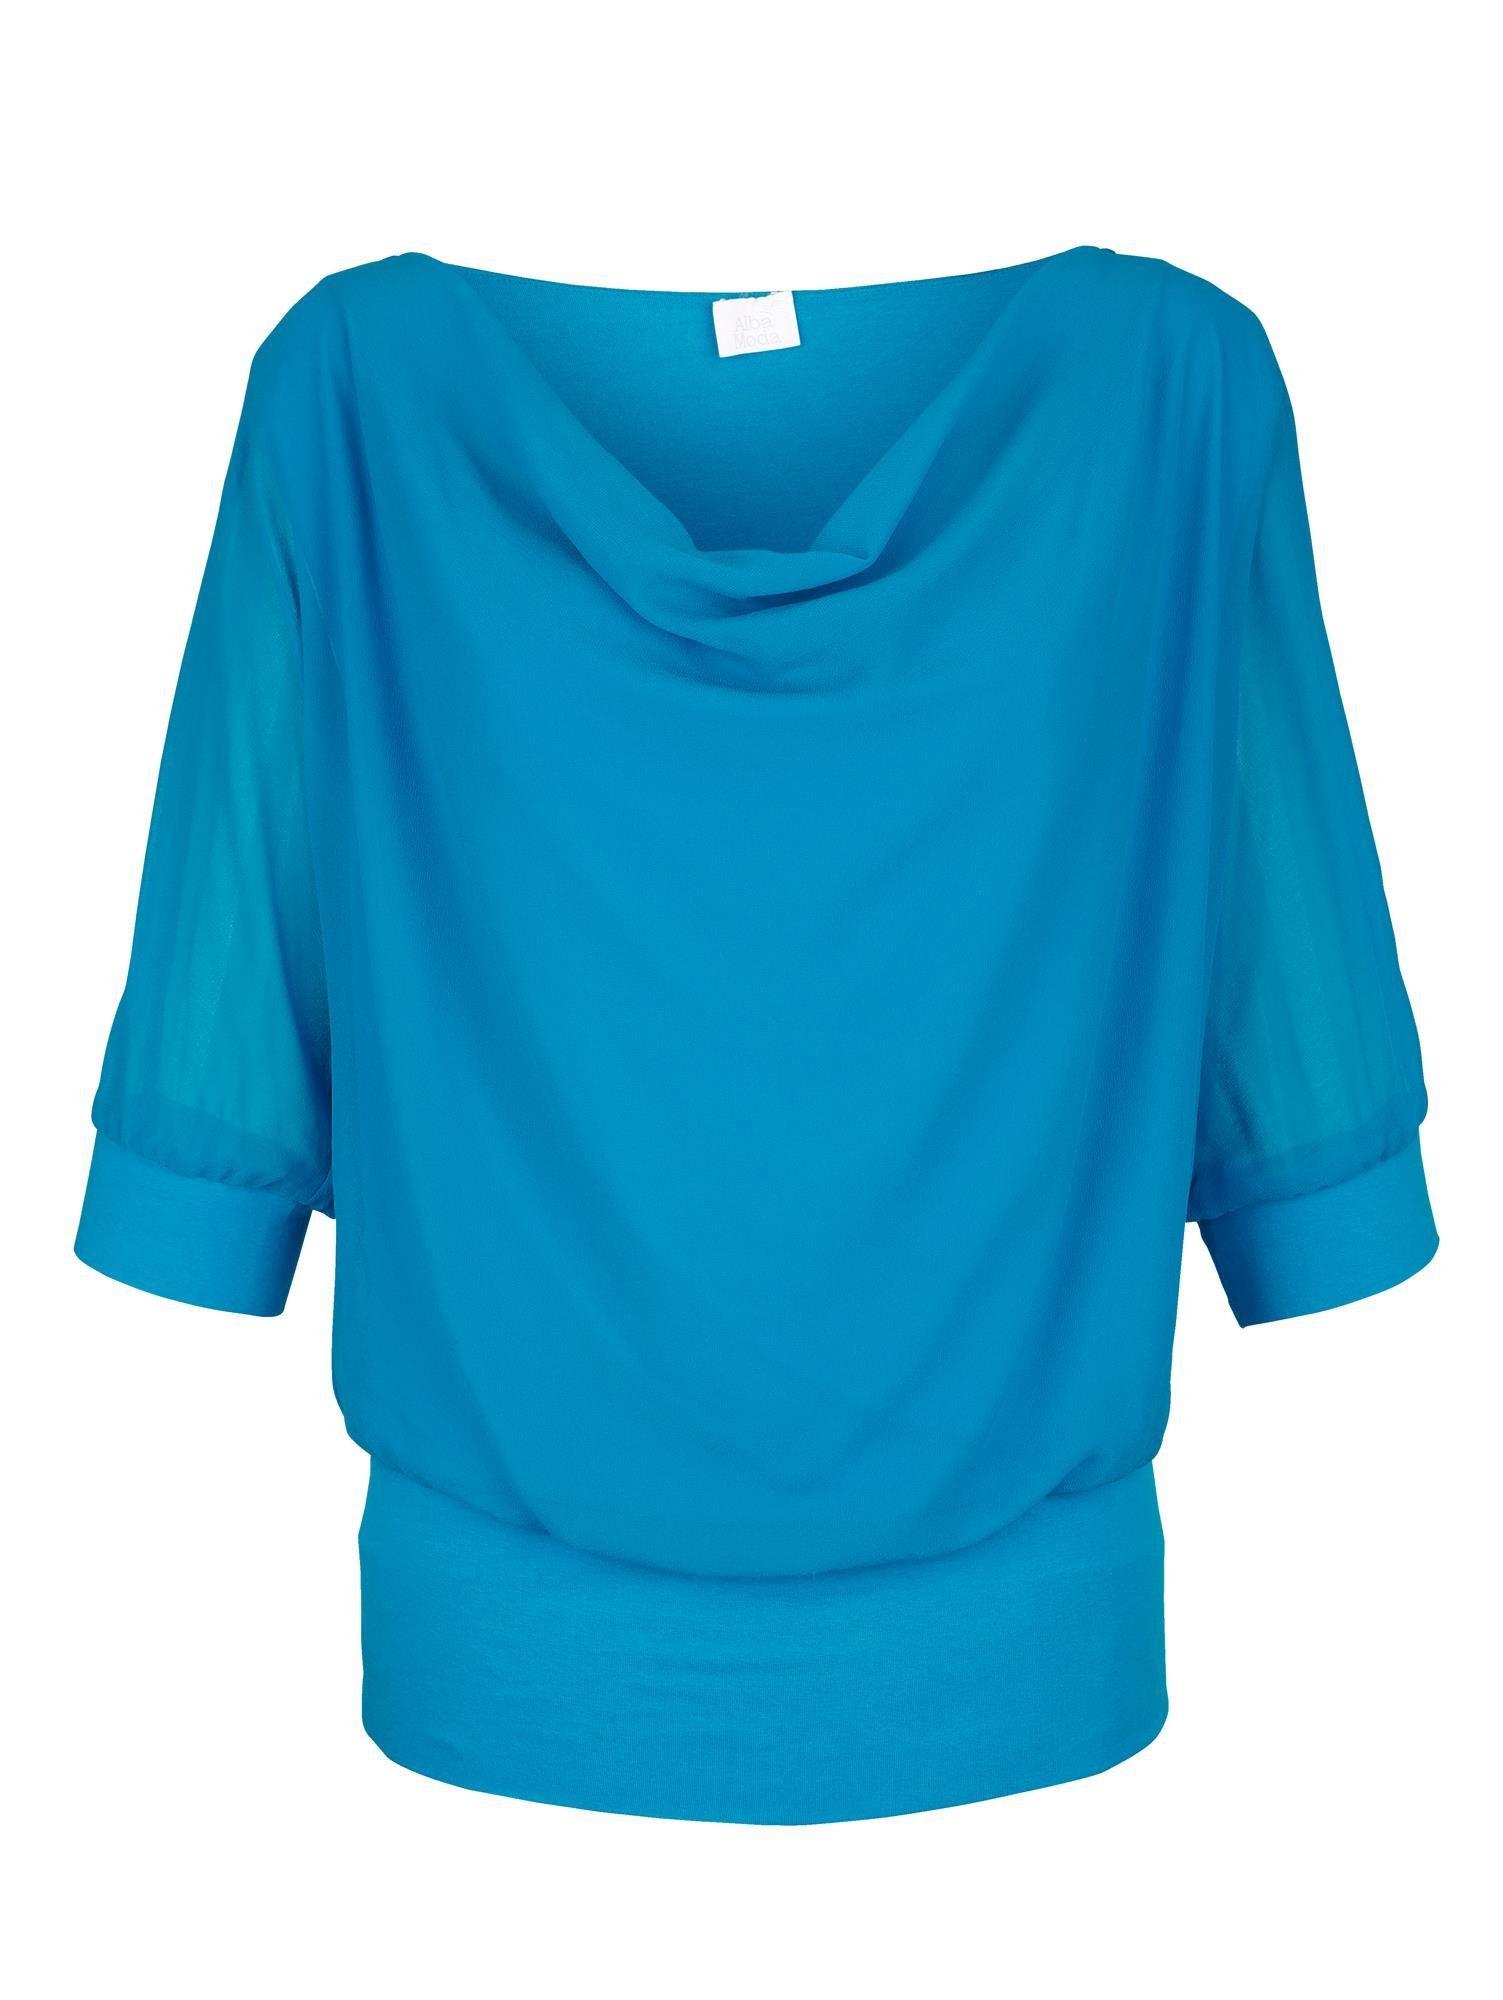 Alba Moda Blusenshirt mit Chiffon-Lage